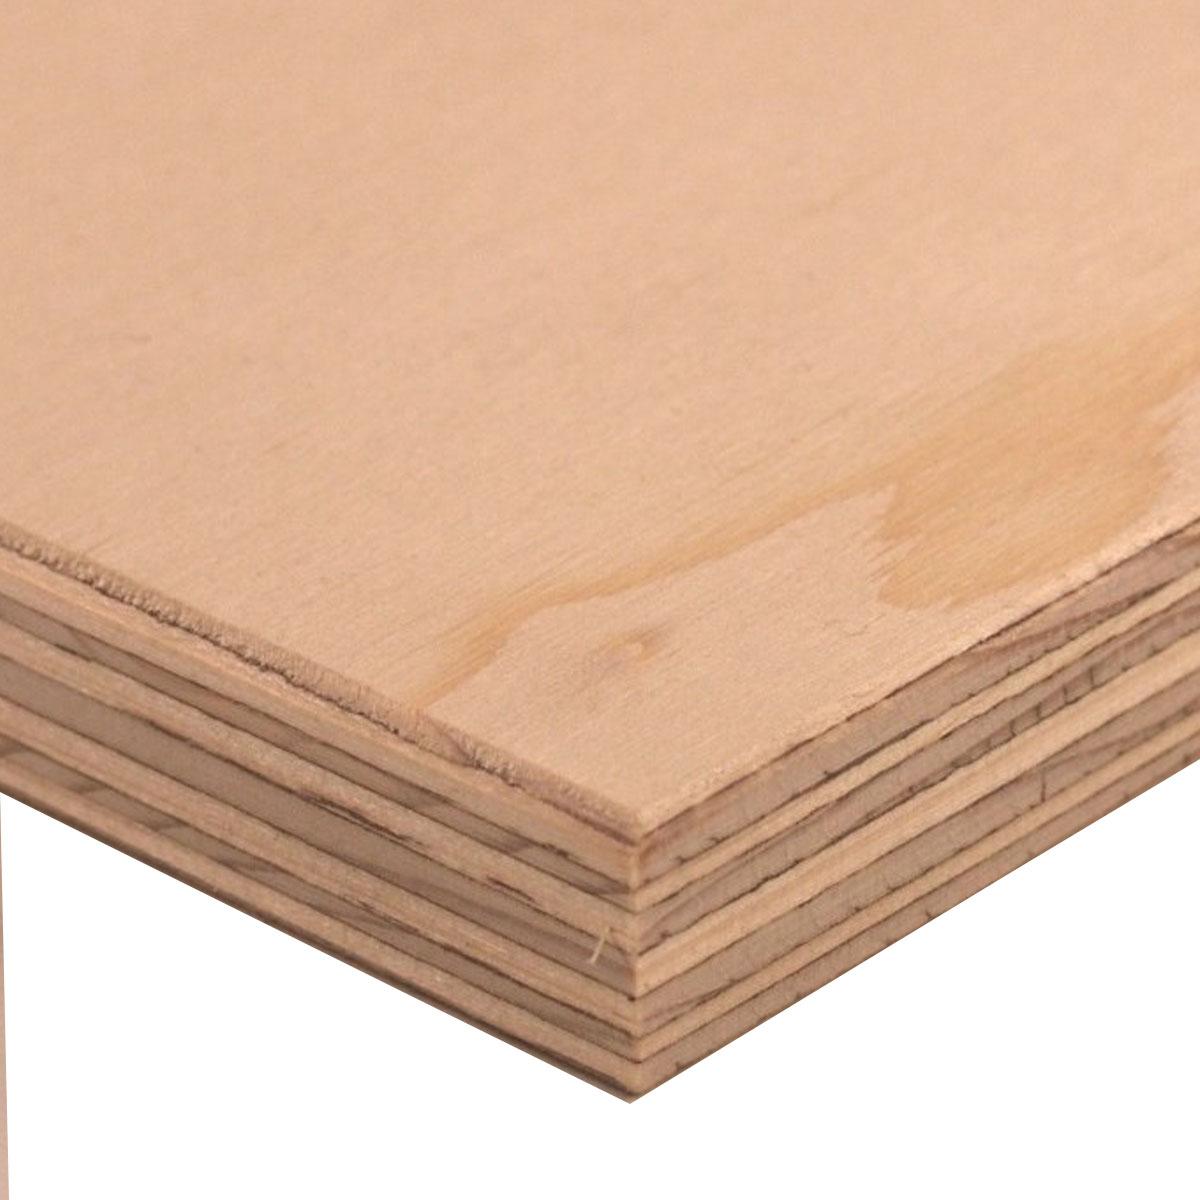 Standard Fir Plywood - TG - 4 x 8 - 15.5 mm - 5/8-in